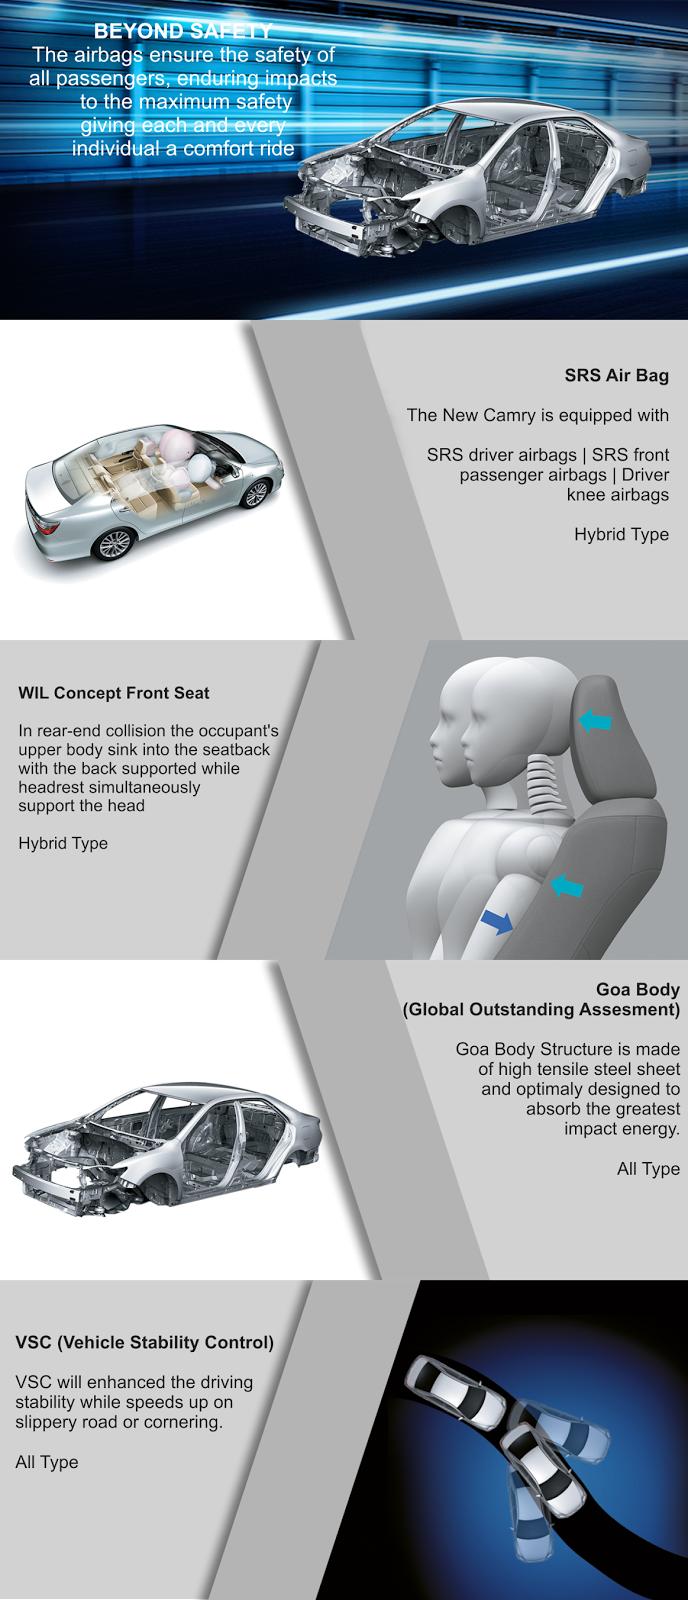 fitur-keselamatan-mobil-new-camry-hybrid